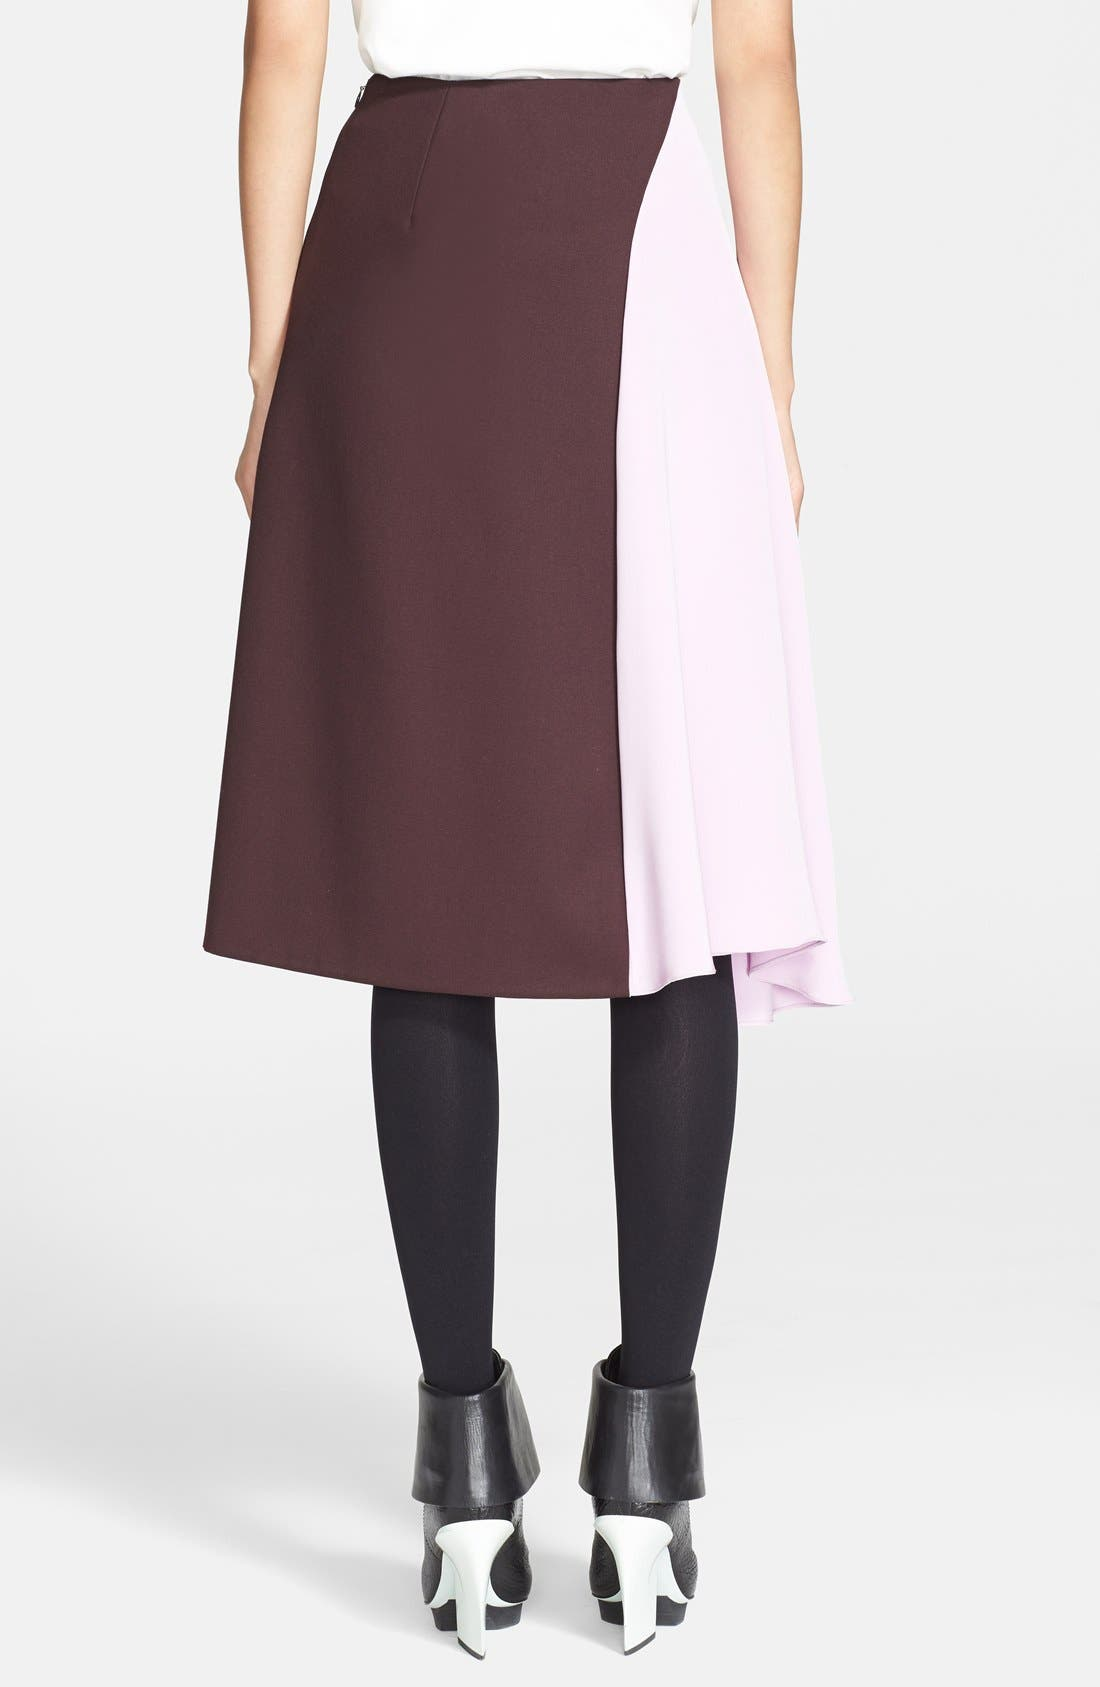 Alternate Image 2  - 3.1 Phillip Lim 'Horizon' Wool & Crêpe de Chine Skirt